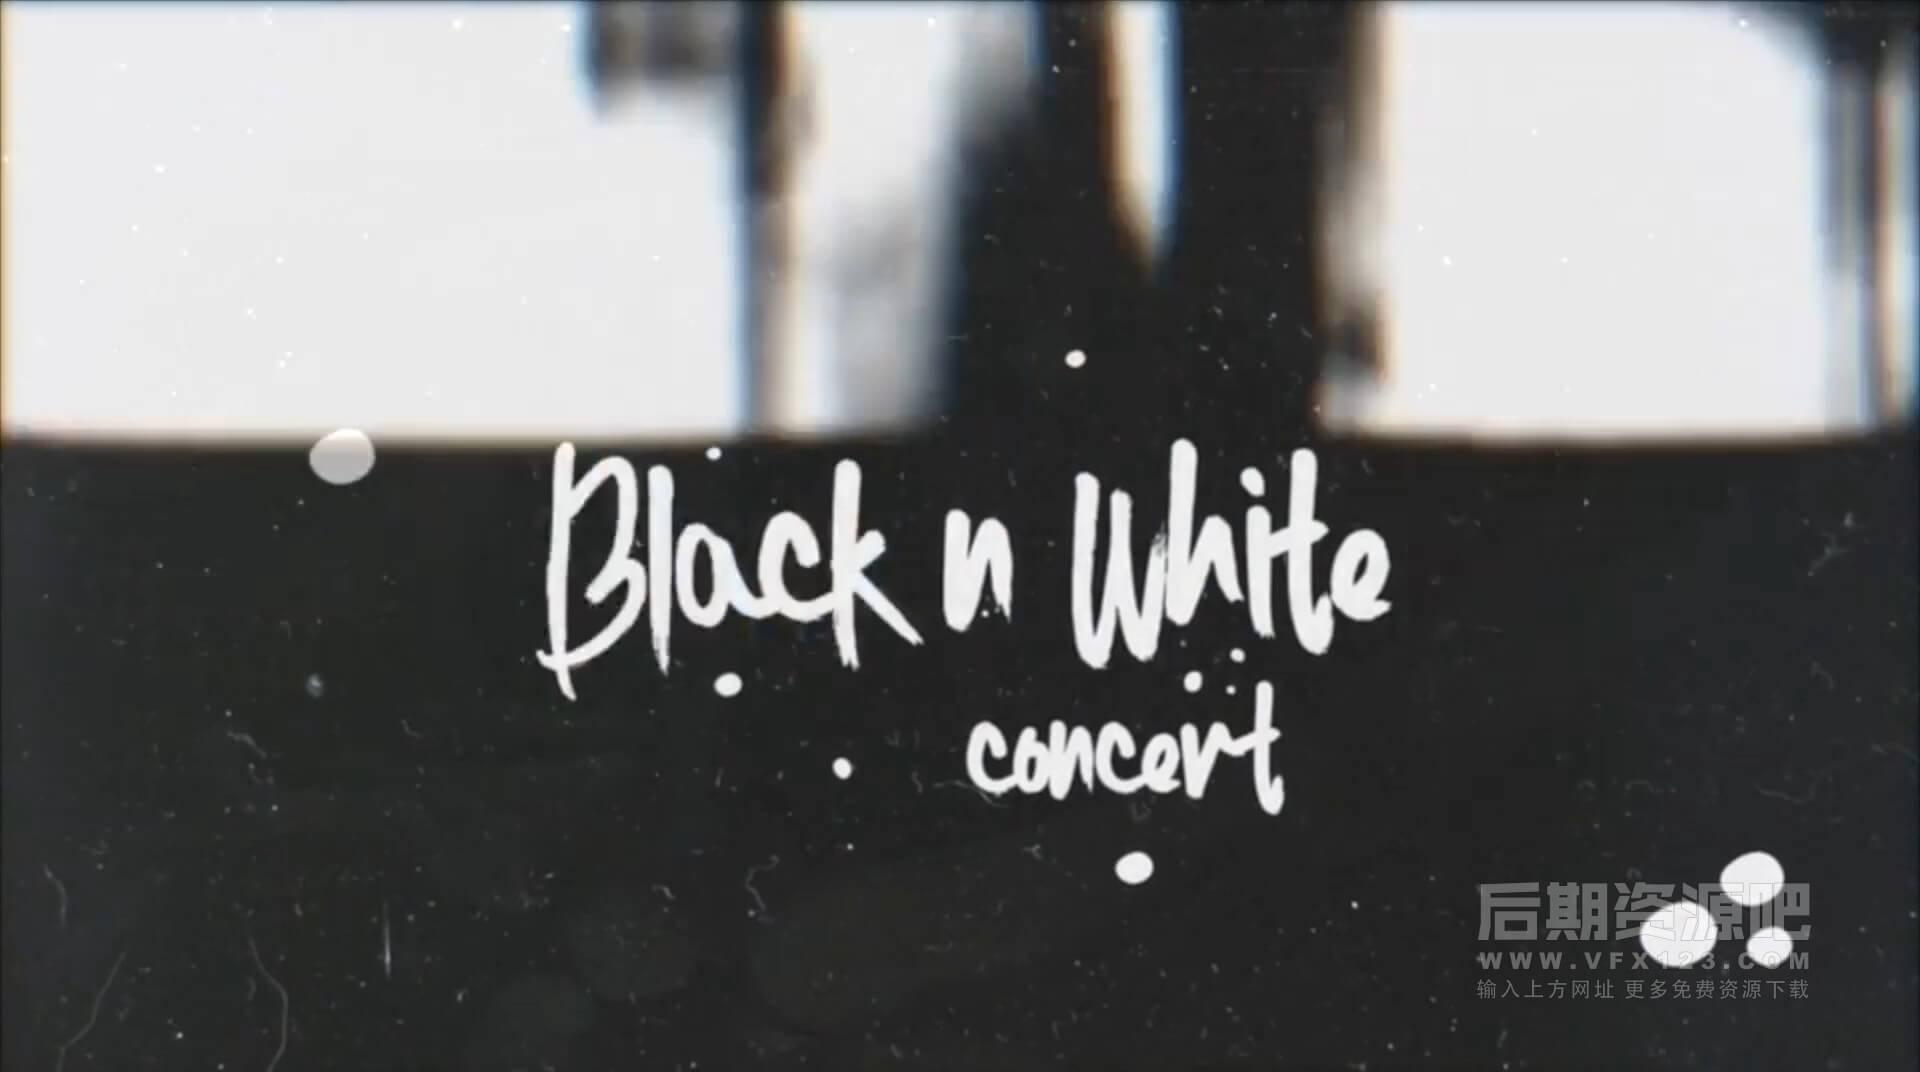 Motion模板 黑白风格DJ摇滚音乐会开场片头 BnW Concert